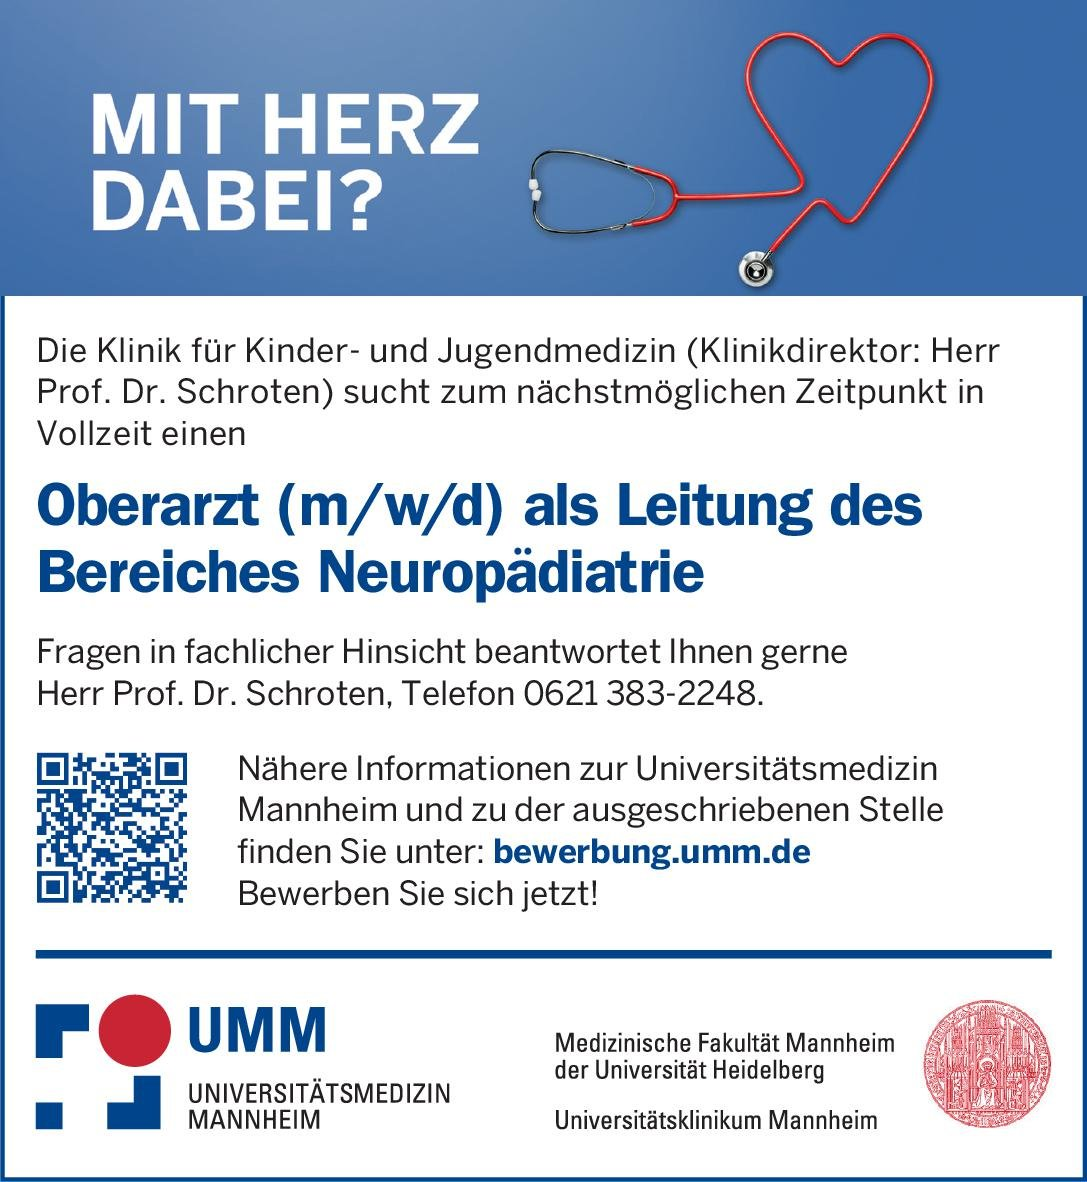 Universitätsklinikum Mannheim Oberarzt (m/w/d) als Leitung des Bereiches Neuropädiatrie  Neuropädiatrie, Kinder- und Jugendmedizin Oberarzt